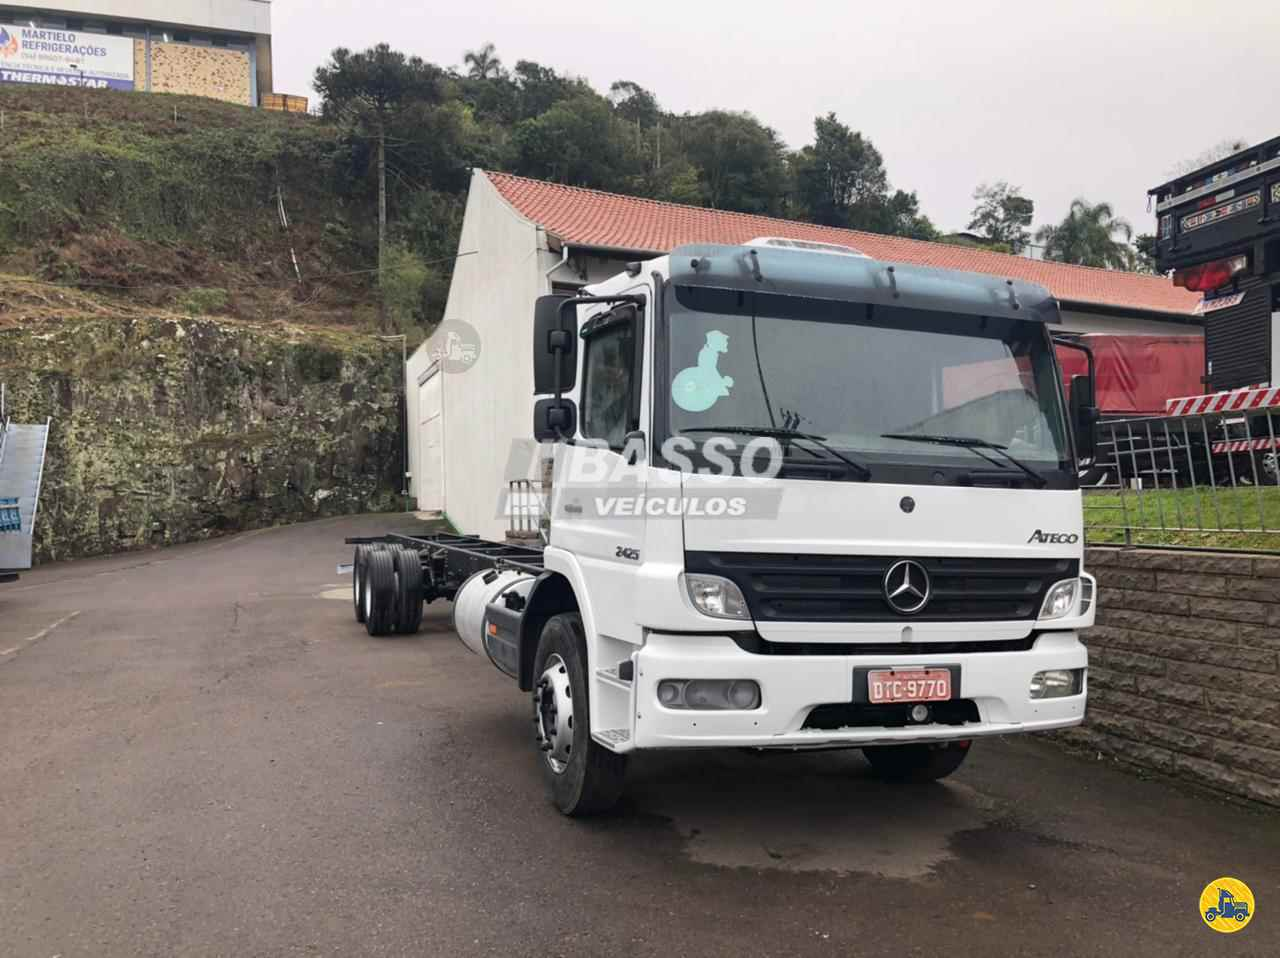 CAMINHAO MERCEDES-BENZ MB 2425 Chassis Truck 6x2 Basso Veículos GARIBALDI RIO GRANDE DO SUL RS